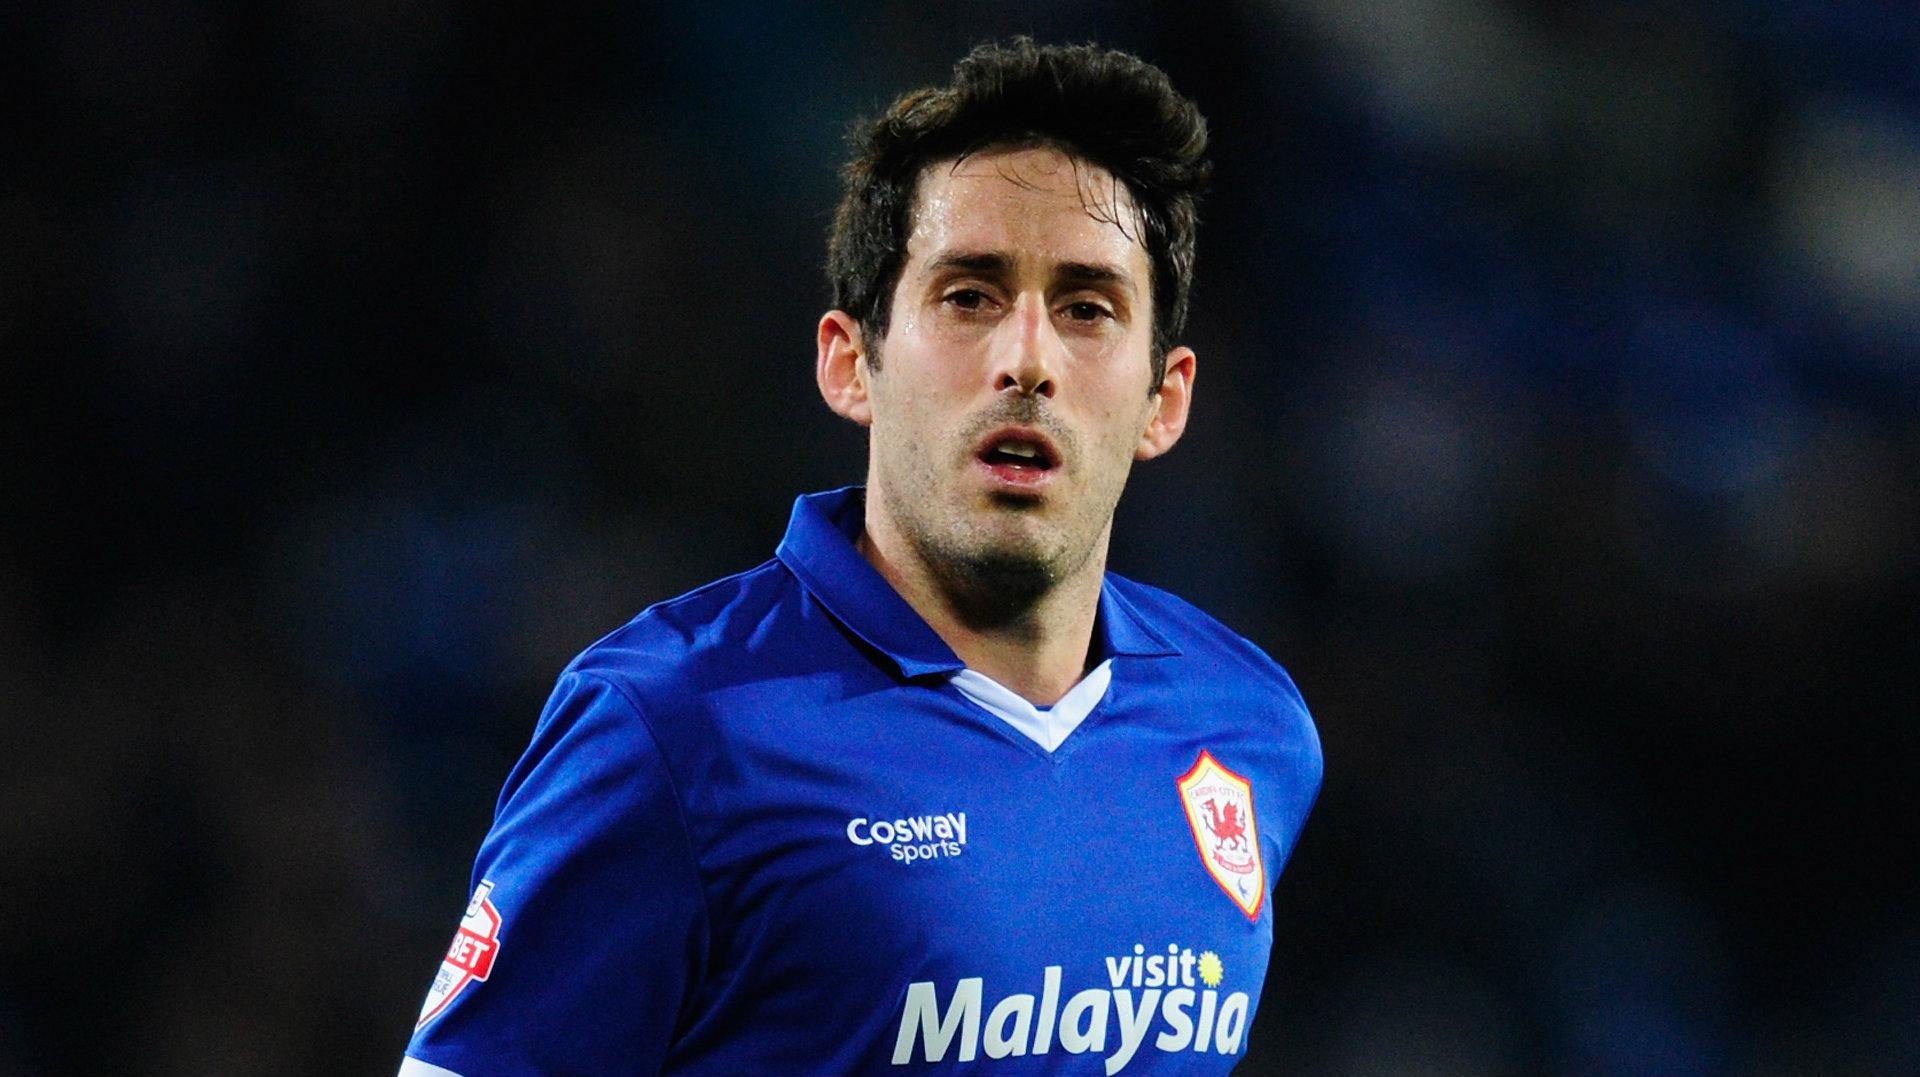 Cardiff announce ex-forward Whittingham has died at 35